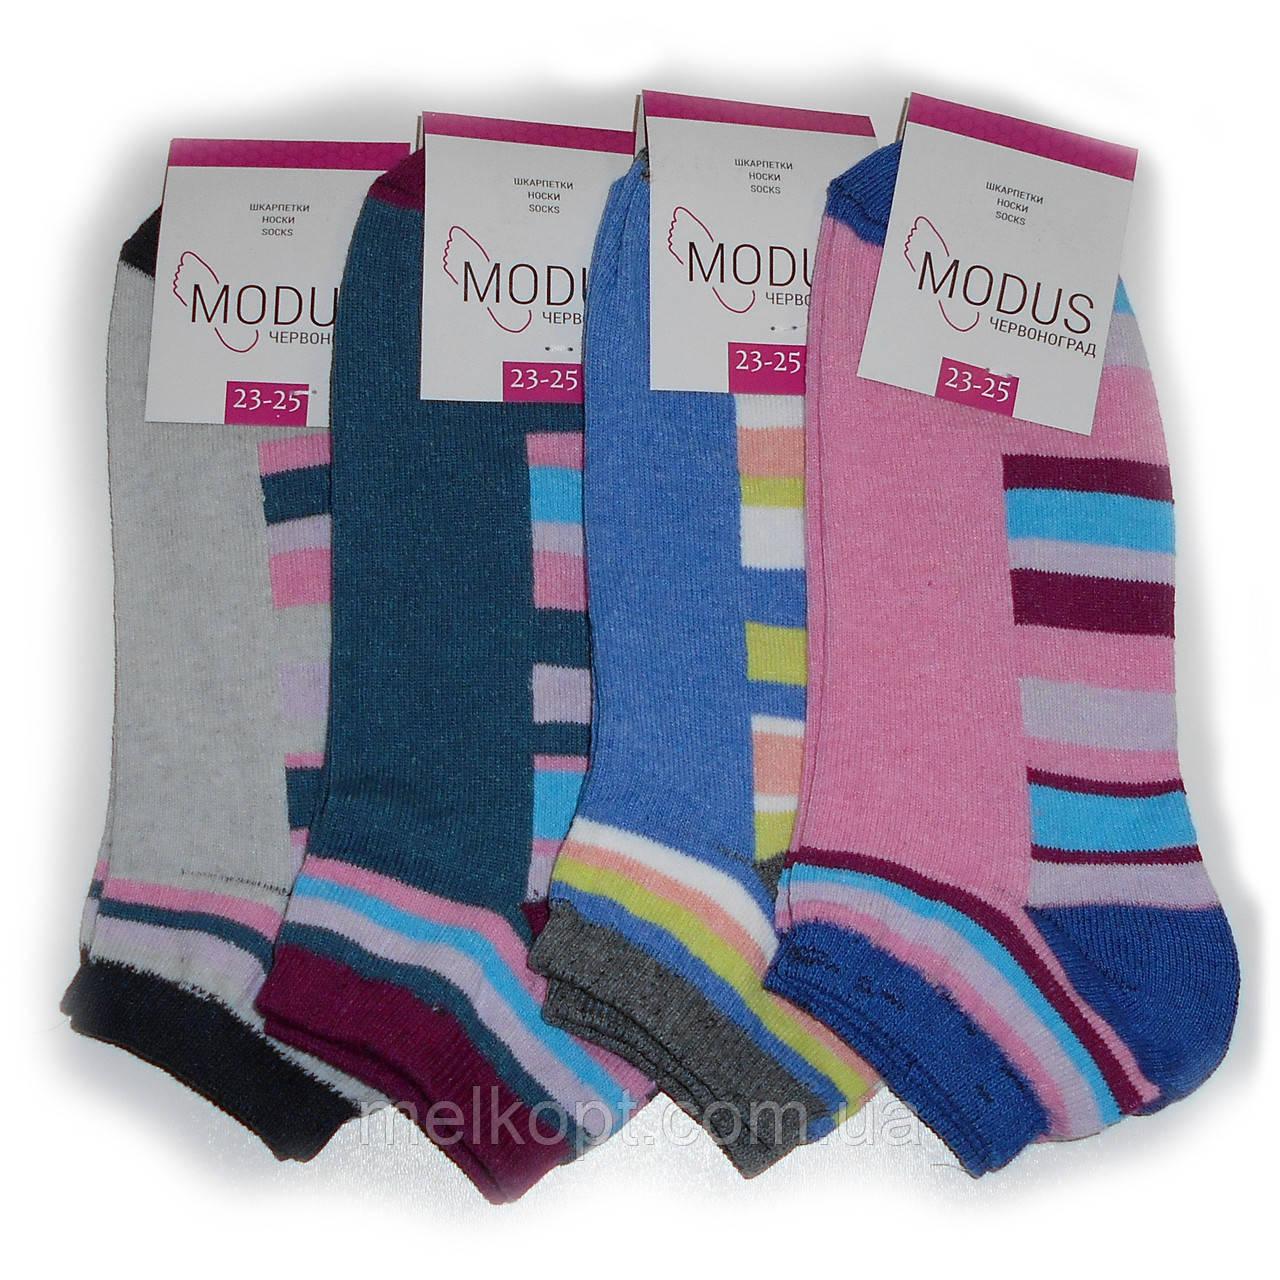 Женские носки Modus - 7,00 грн./пара (короткие, полуполоска)